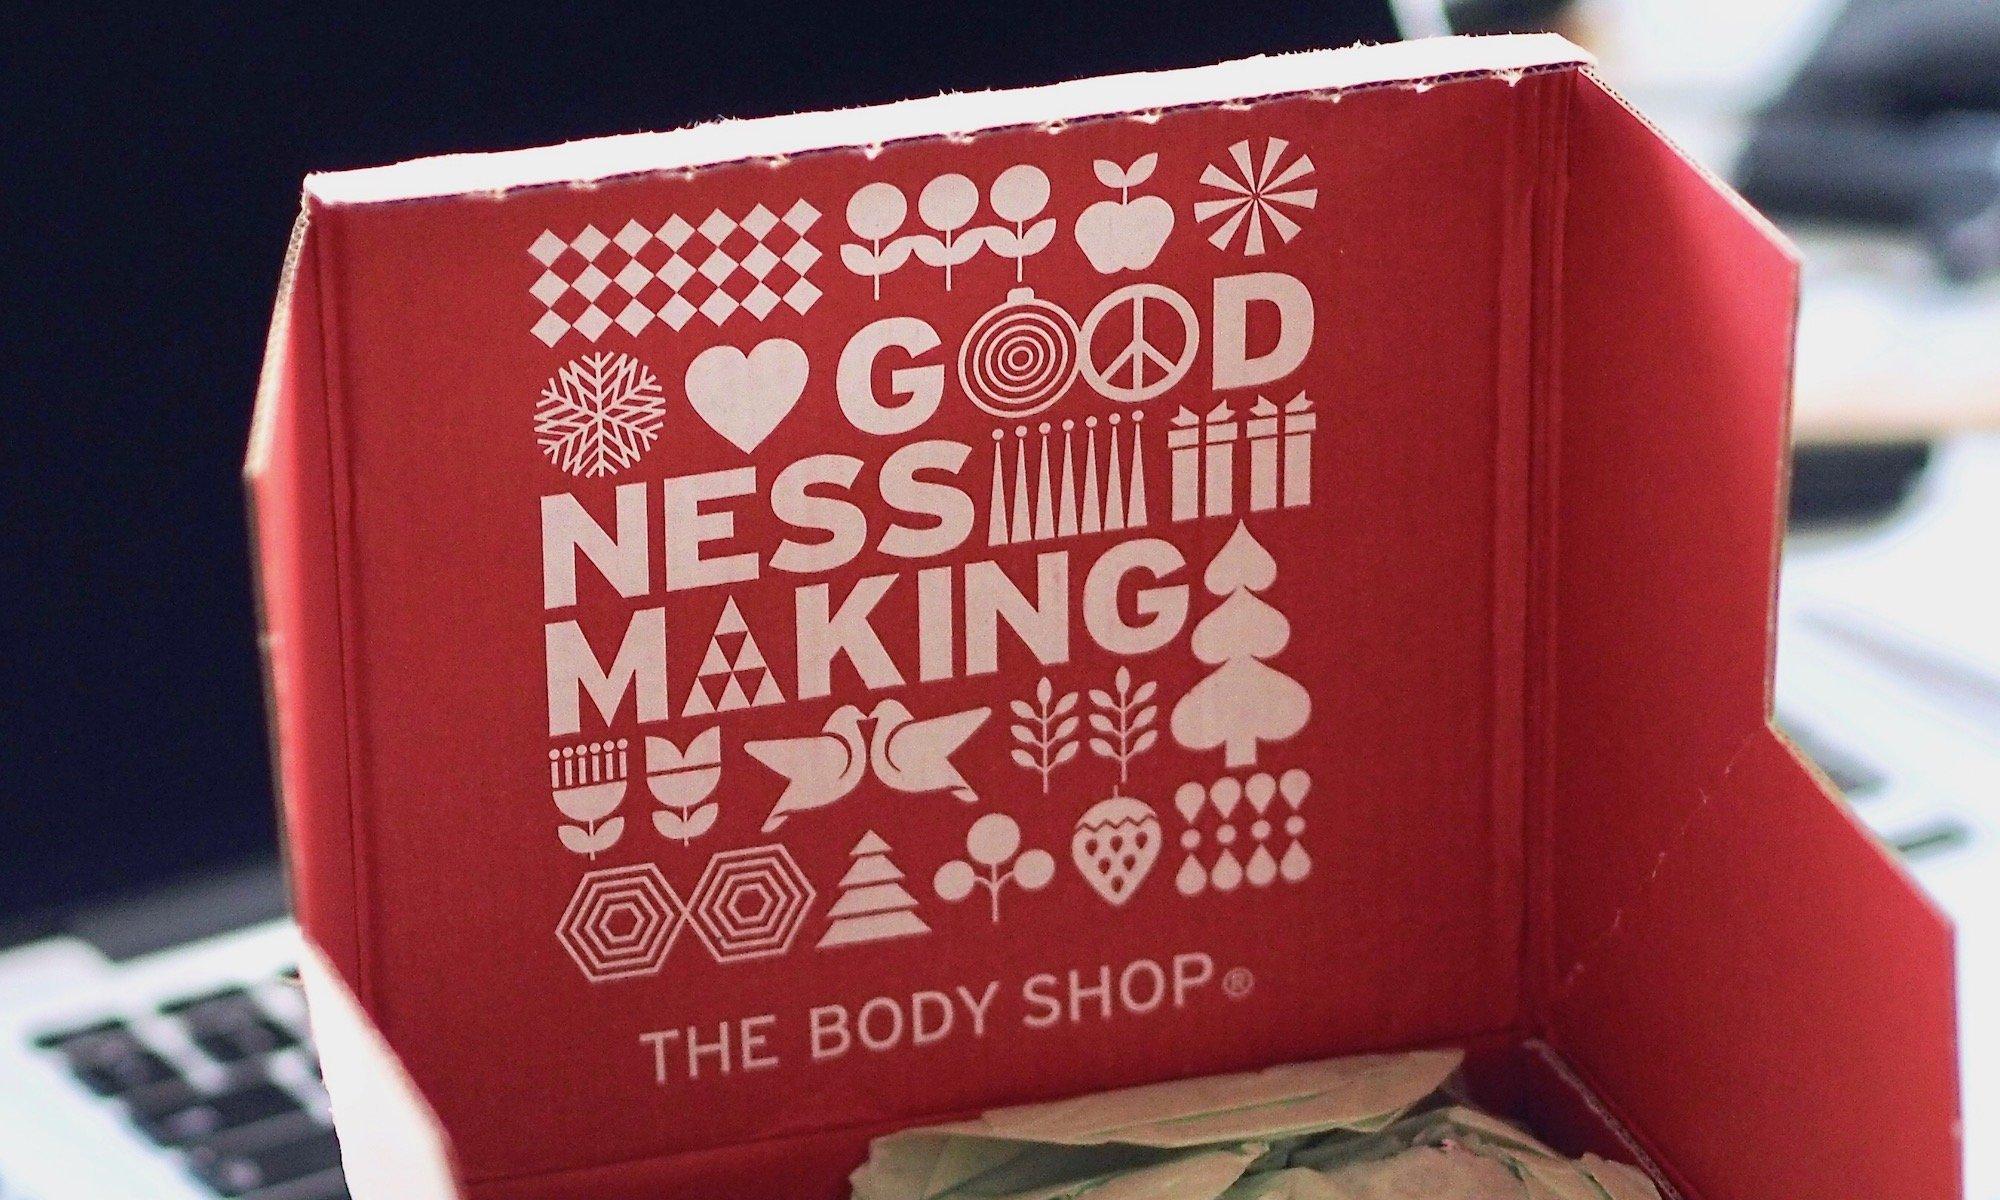 Einkaufserlebnis The Body Shop | Foto: konsensor.de